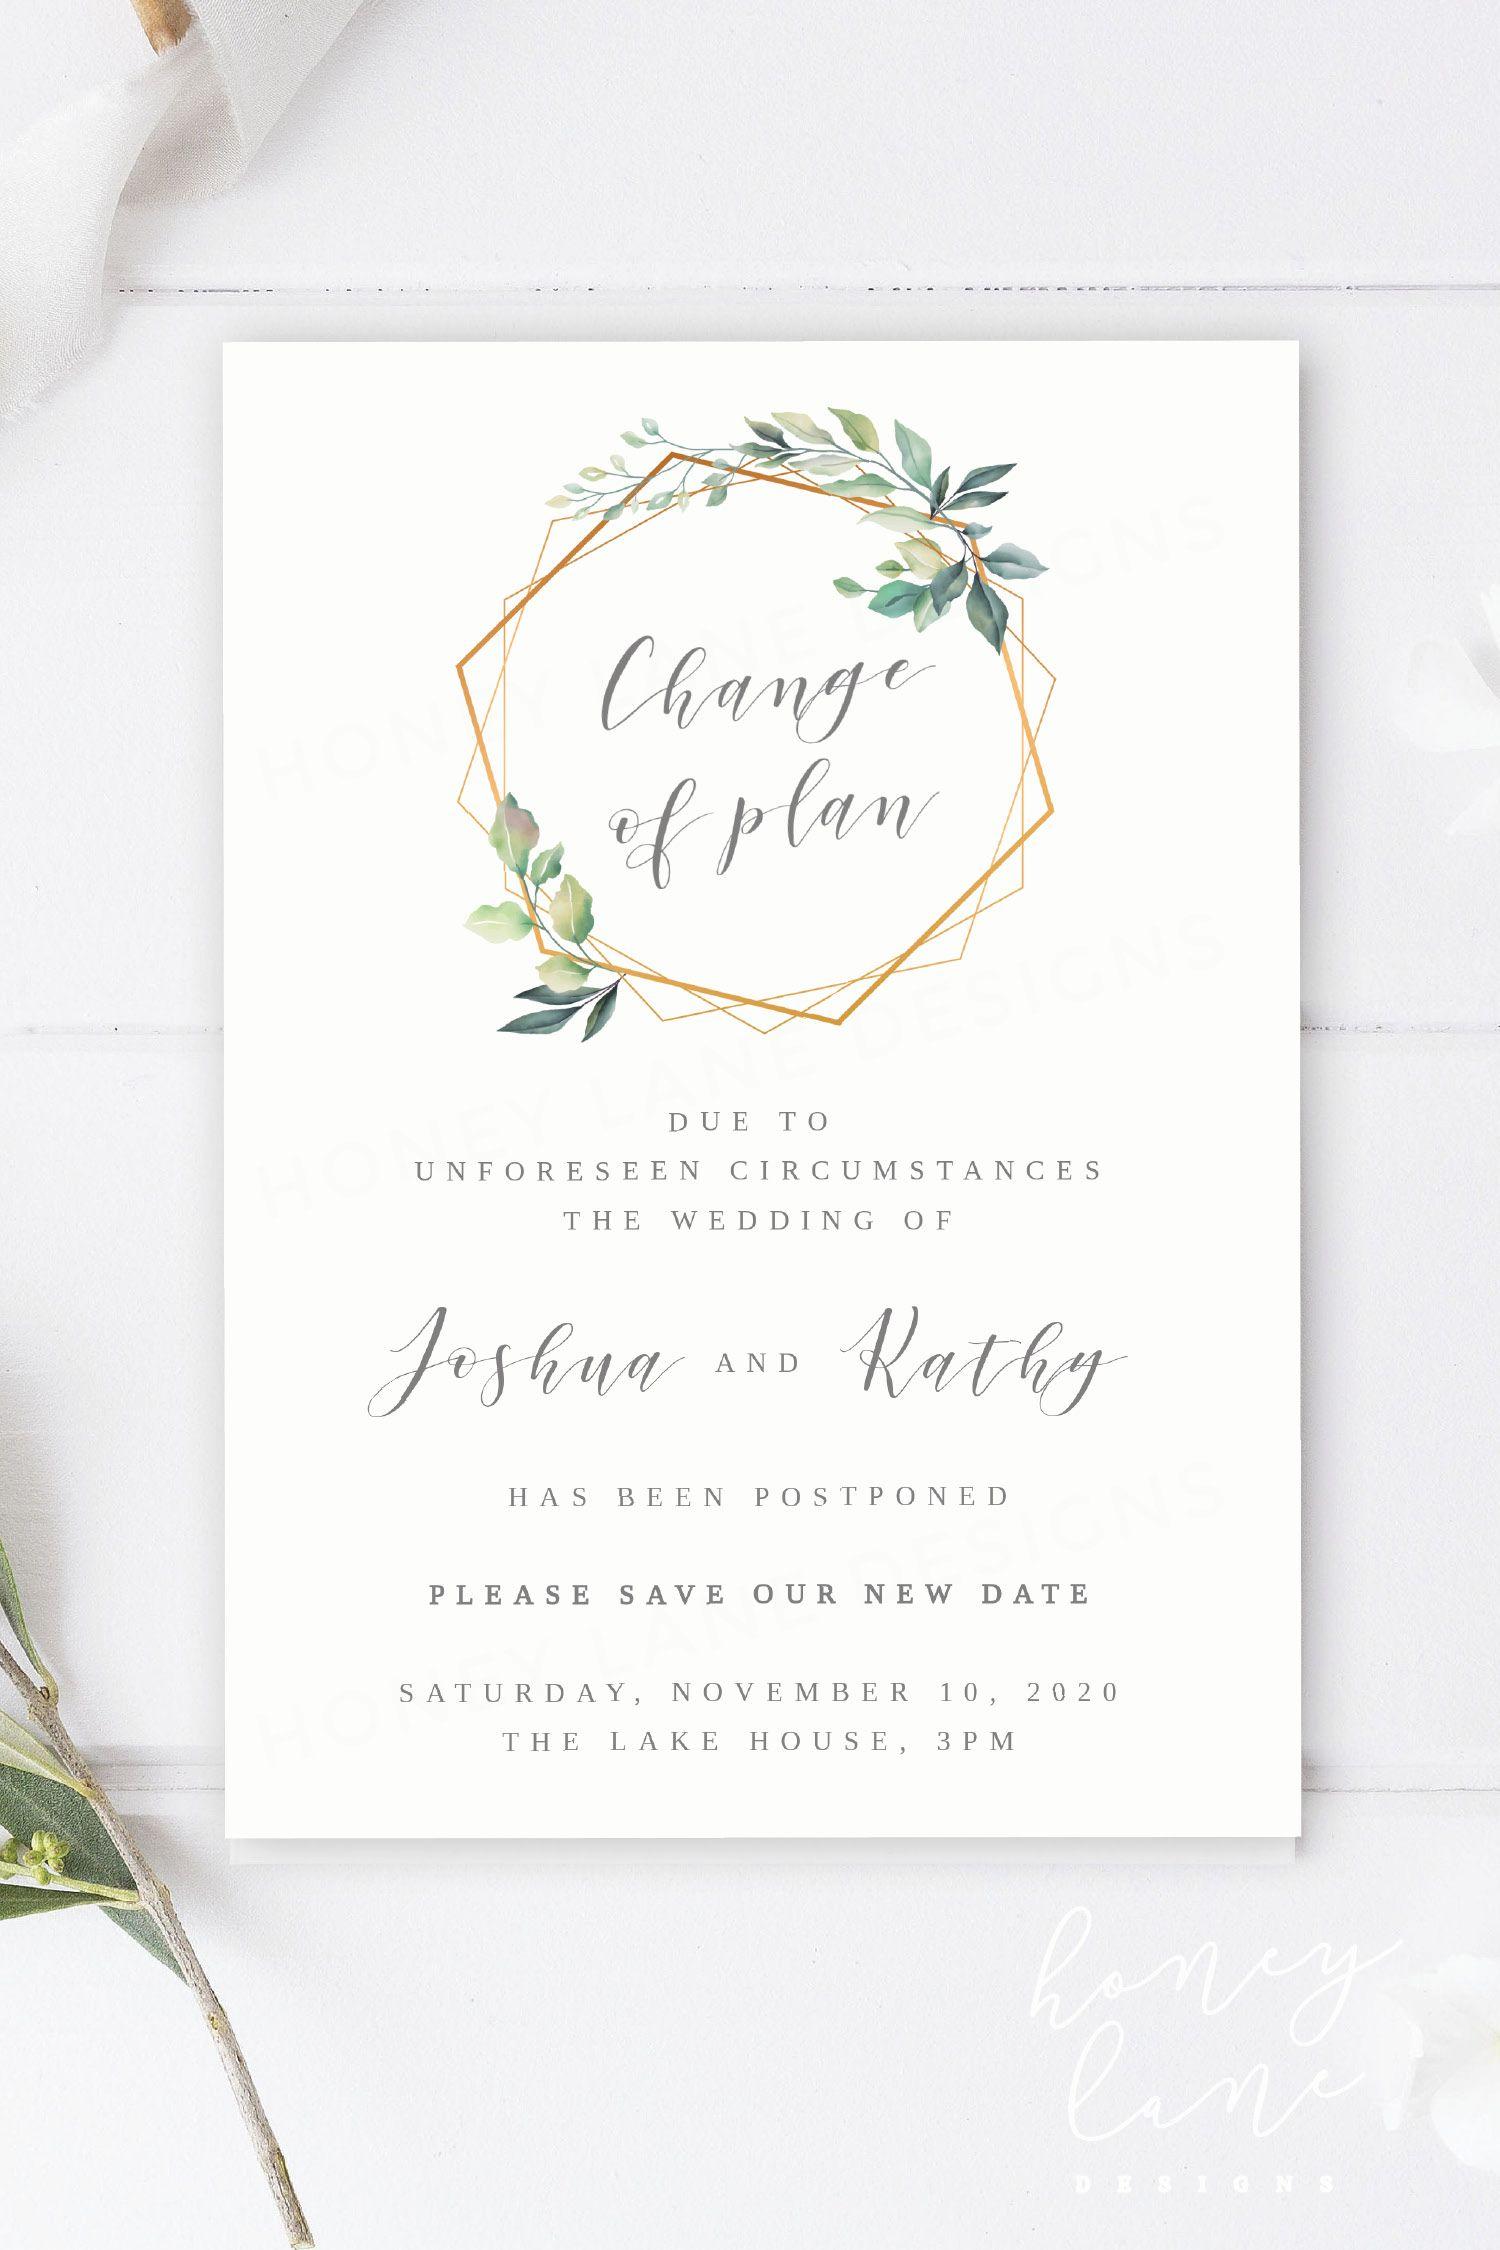 WE DESIGN & EDIT Printable Wedding Date Change